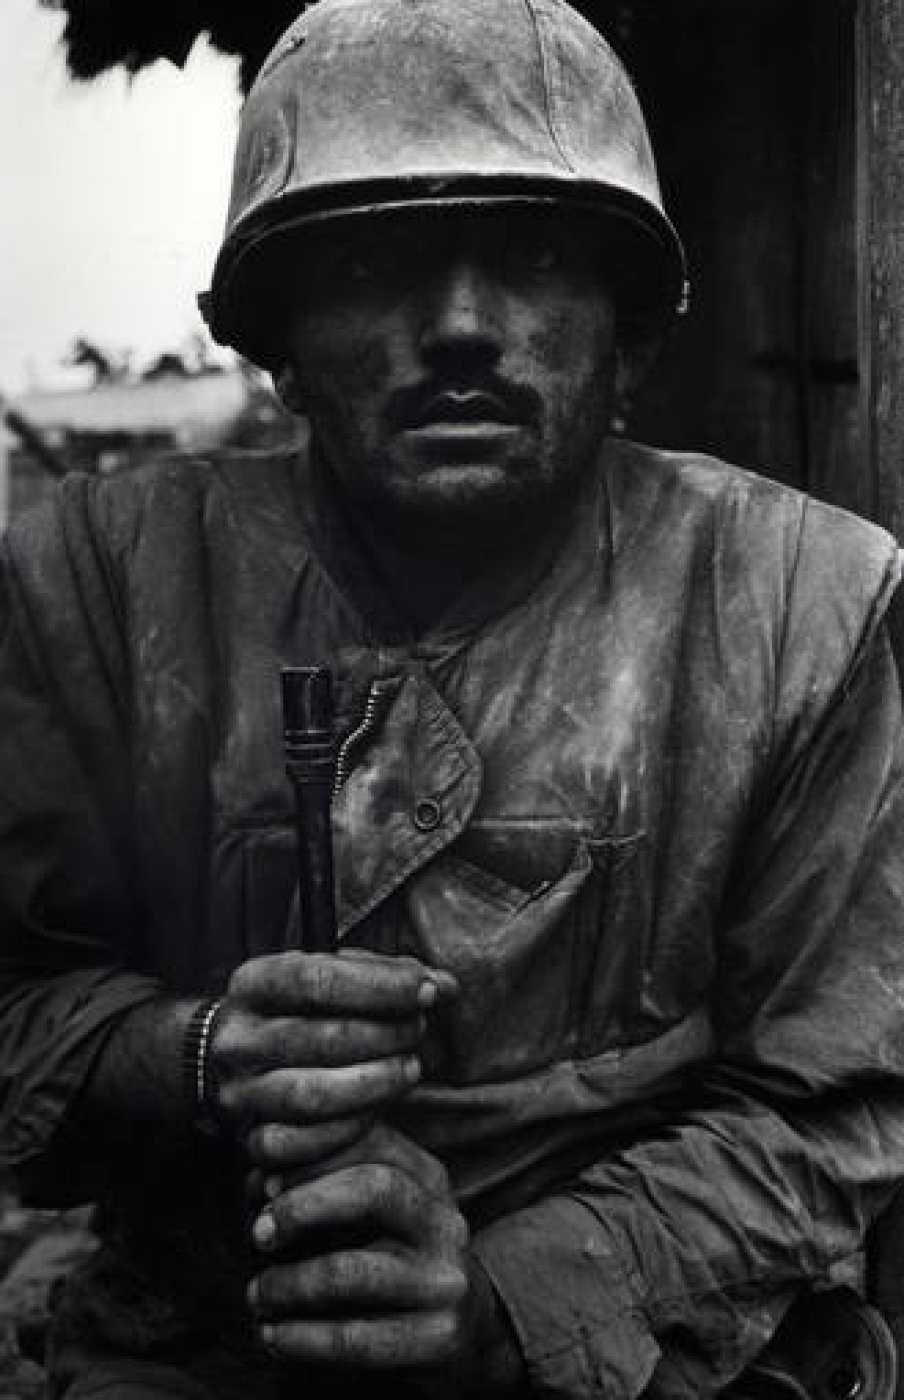 Don McCullin, Marine norteamericano en estado de shock, batalla de Hue (1968)